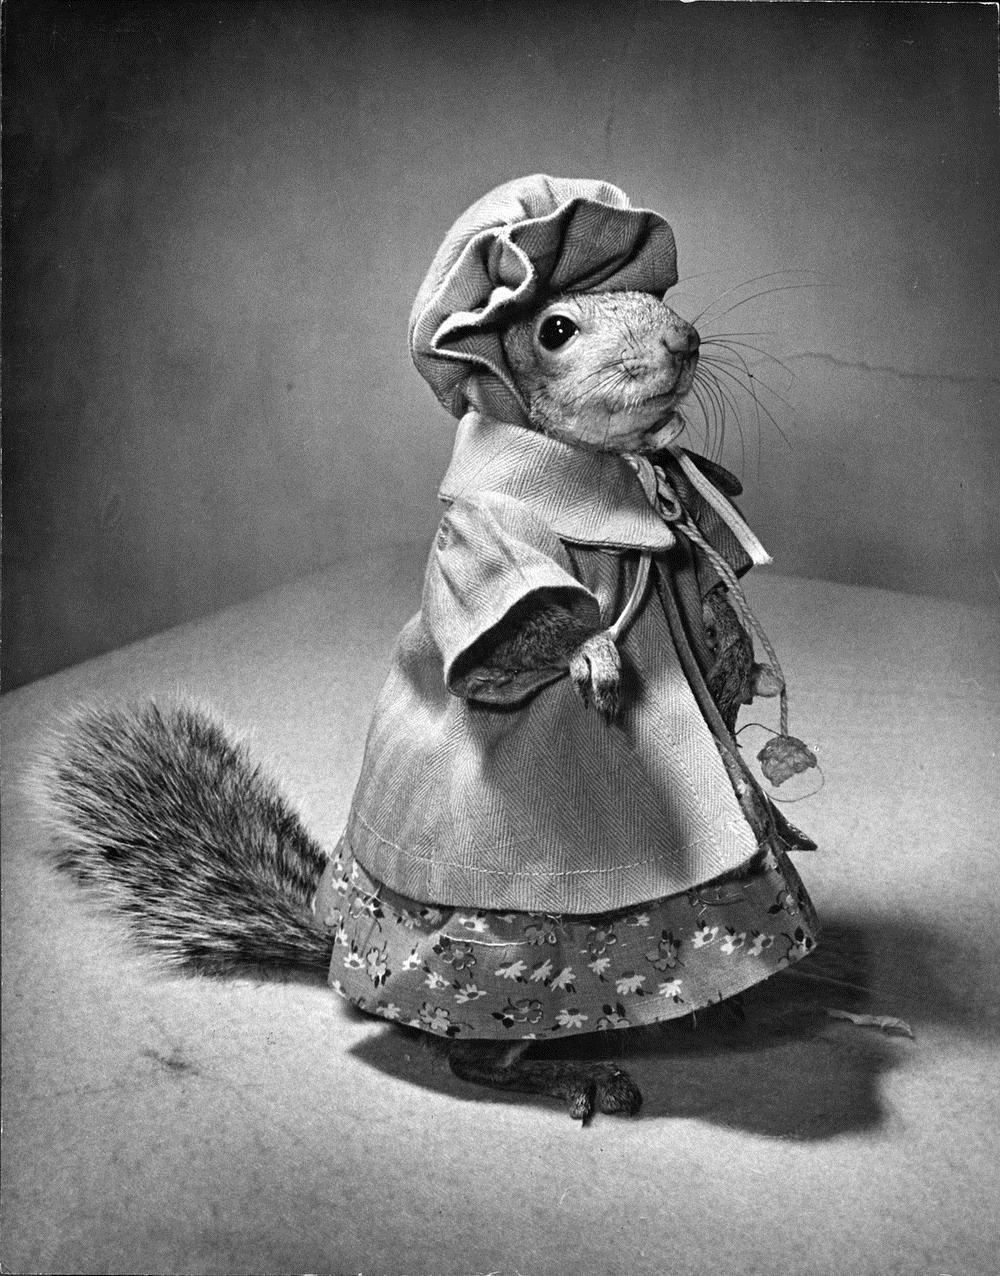 tommy-tucker-squirrel-5